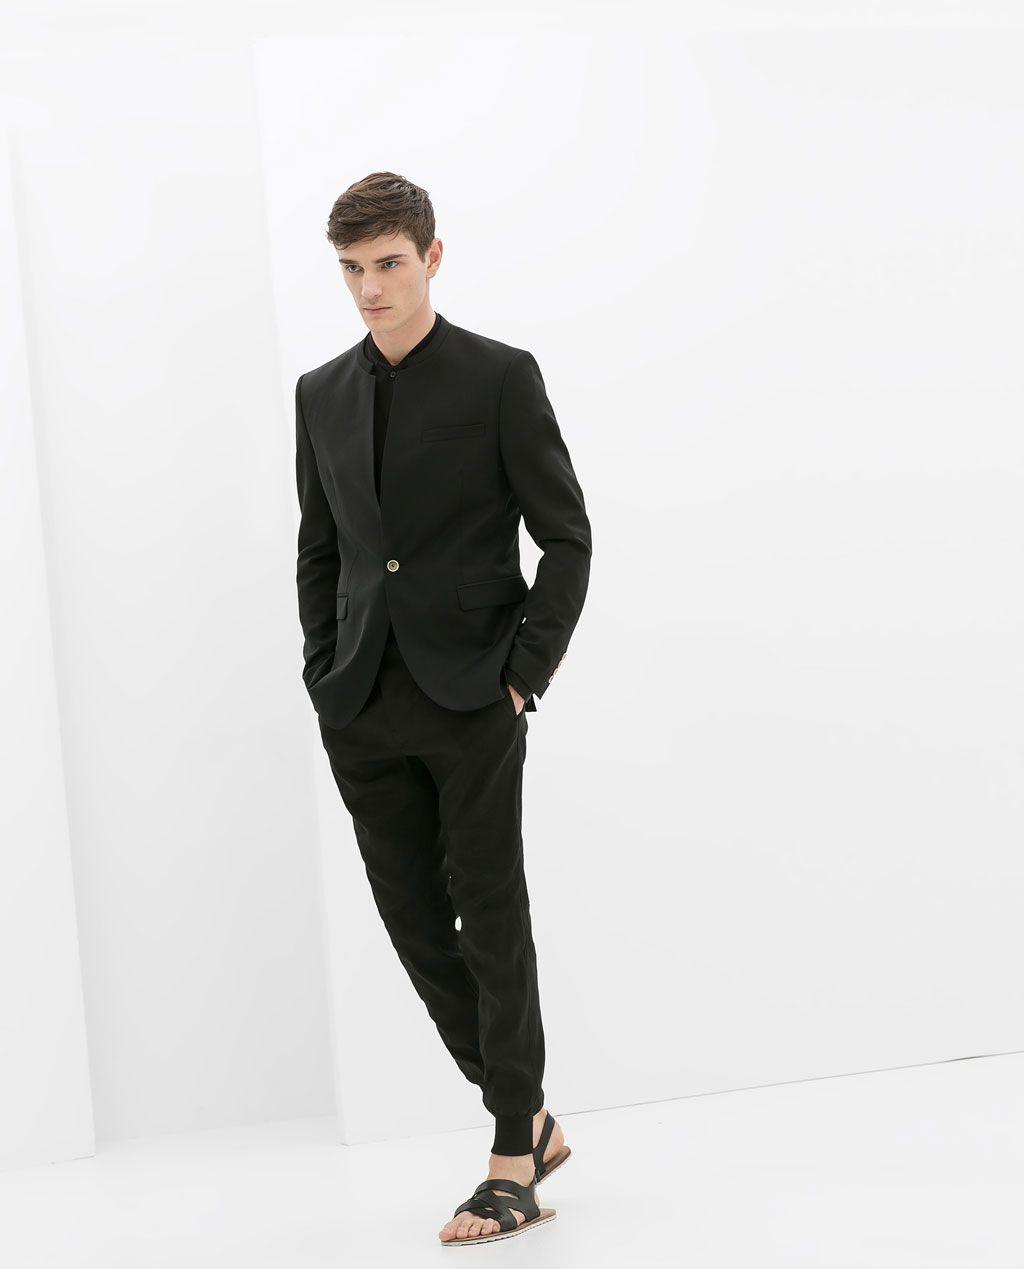 4f73a159 BLAZER WITH NO LAPEL from Zara | Black Obsession in 2019 | Blazers ...